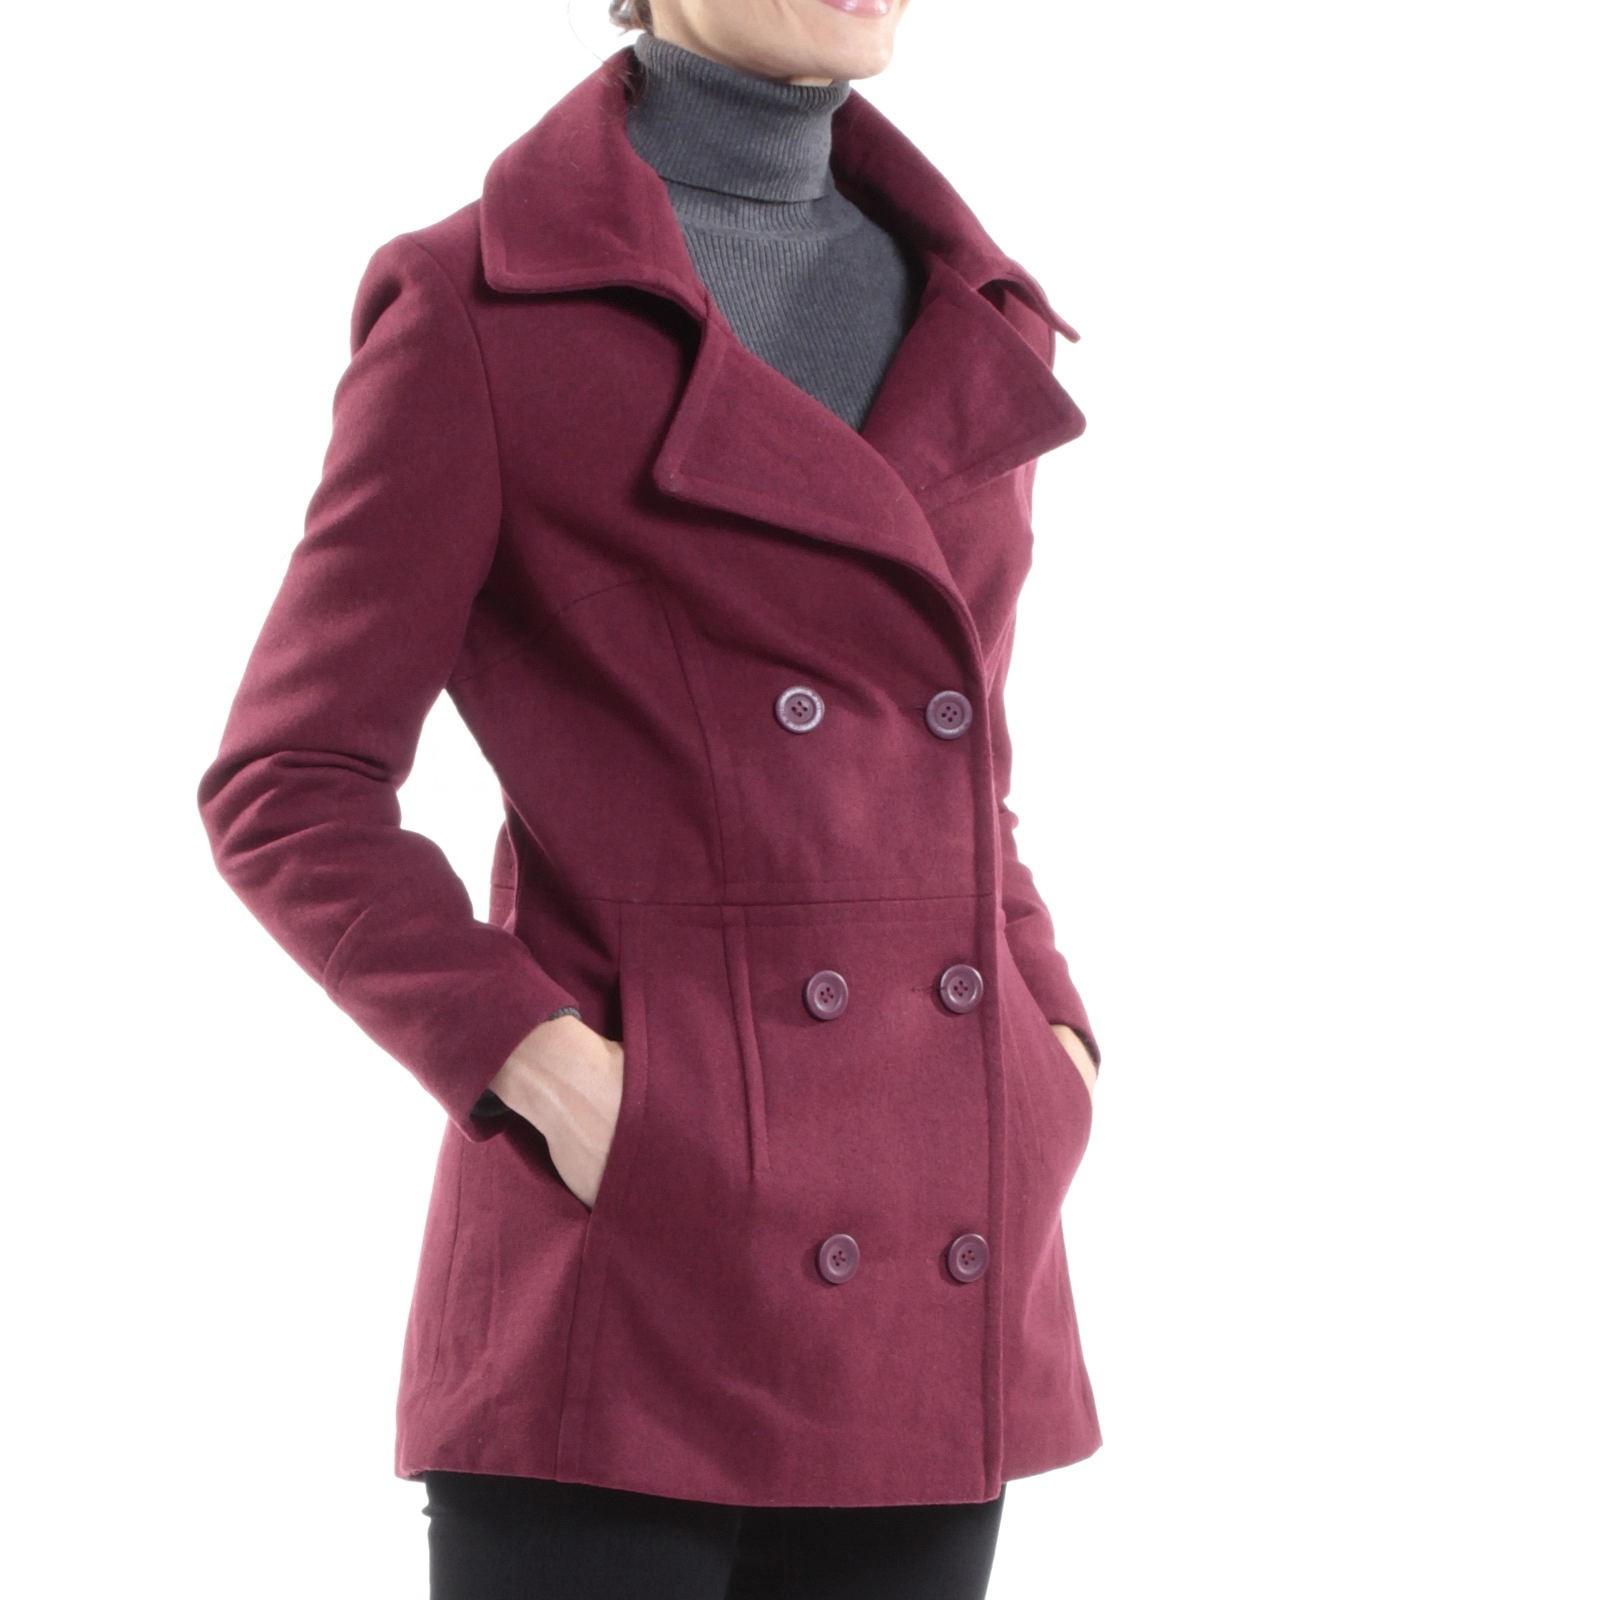 Alpine-Swiss-Emma-Womens-Peacoat-Jacket-Wool-Blazer-Double-Breasted-Overcoat-New thumbnail 29